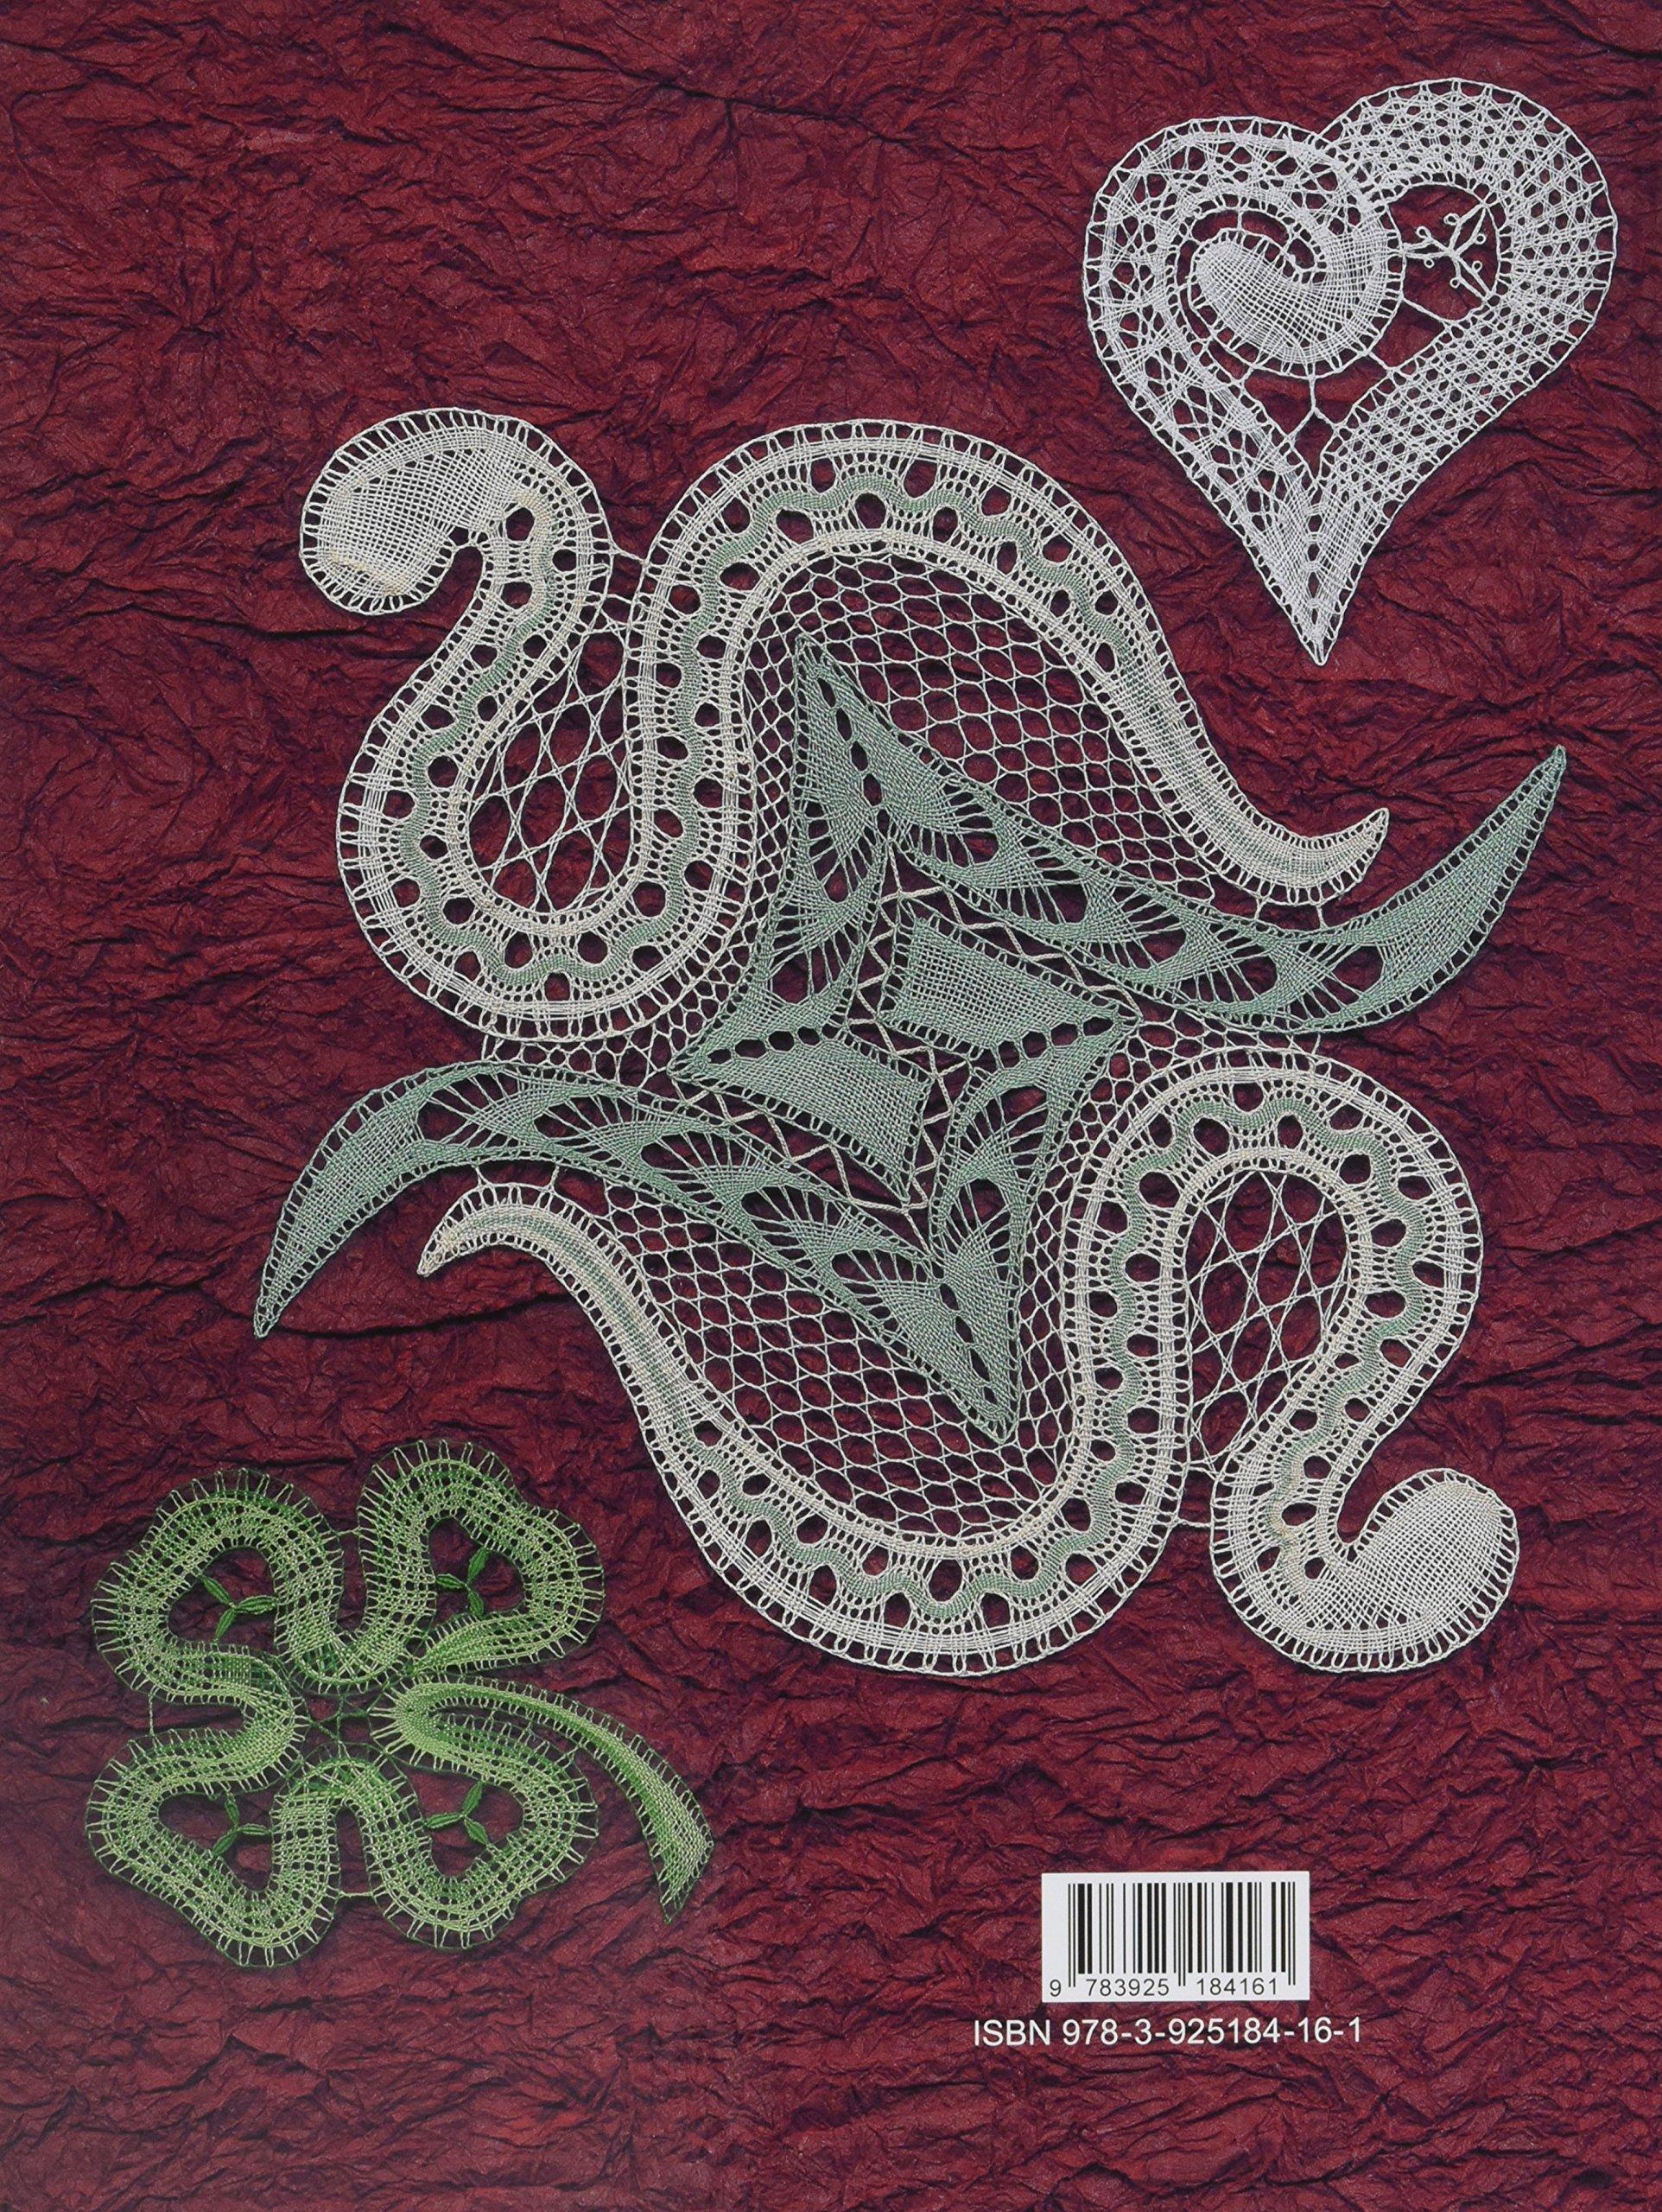 Mailänder Spitze / Milanese Lace: - gestern und heute / - yesterday and  today: Amazon.co.uk: Barbara Corbet: 9783925184161: Books